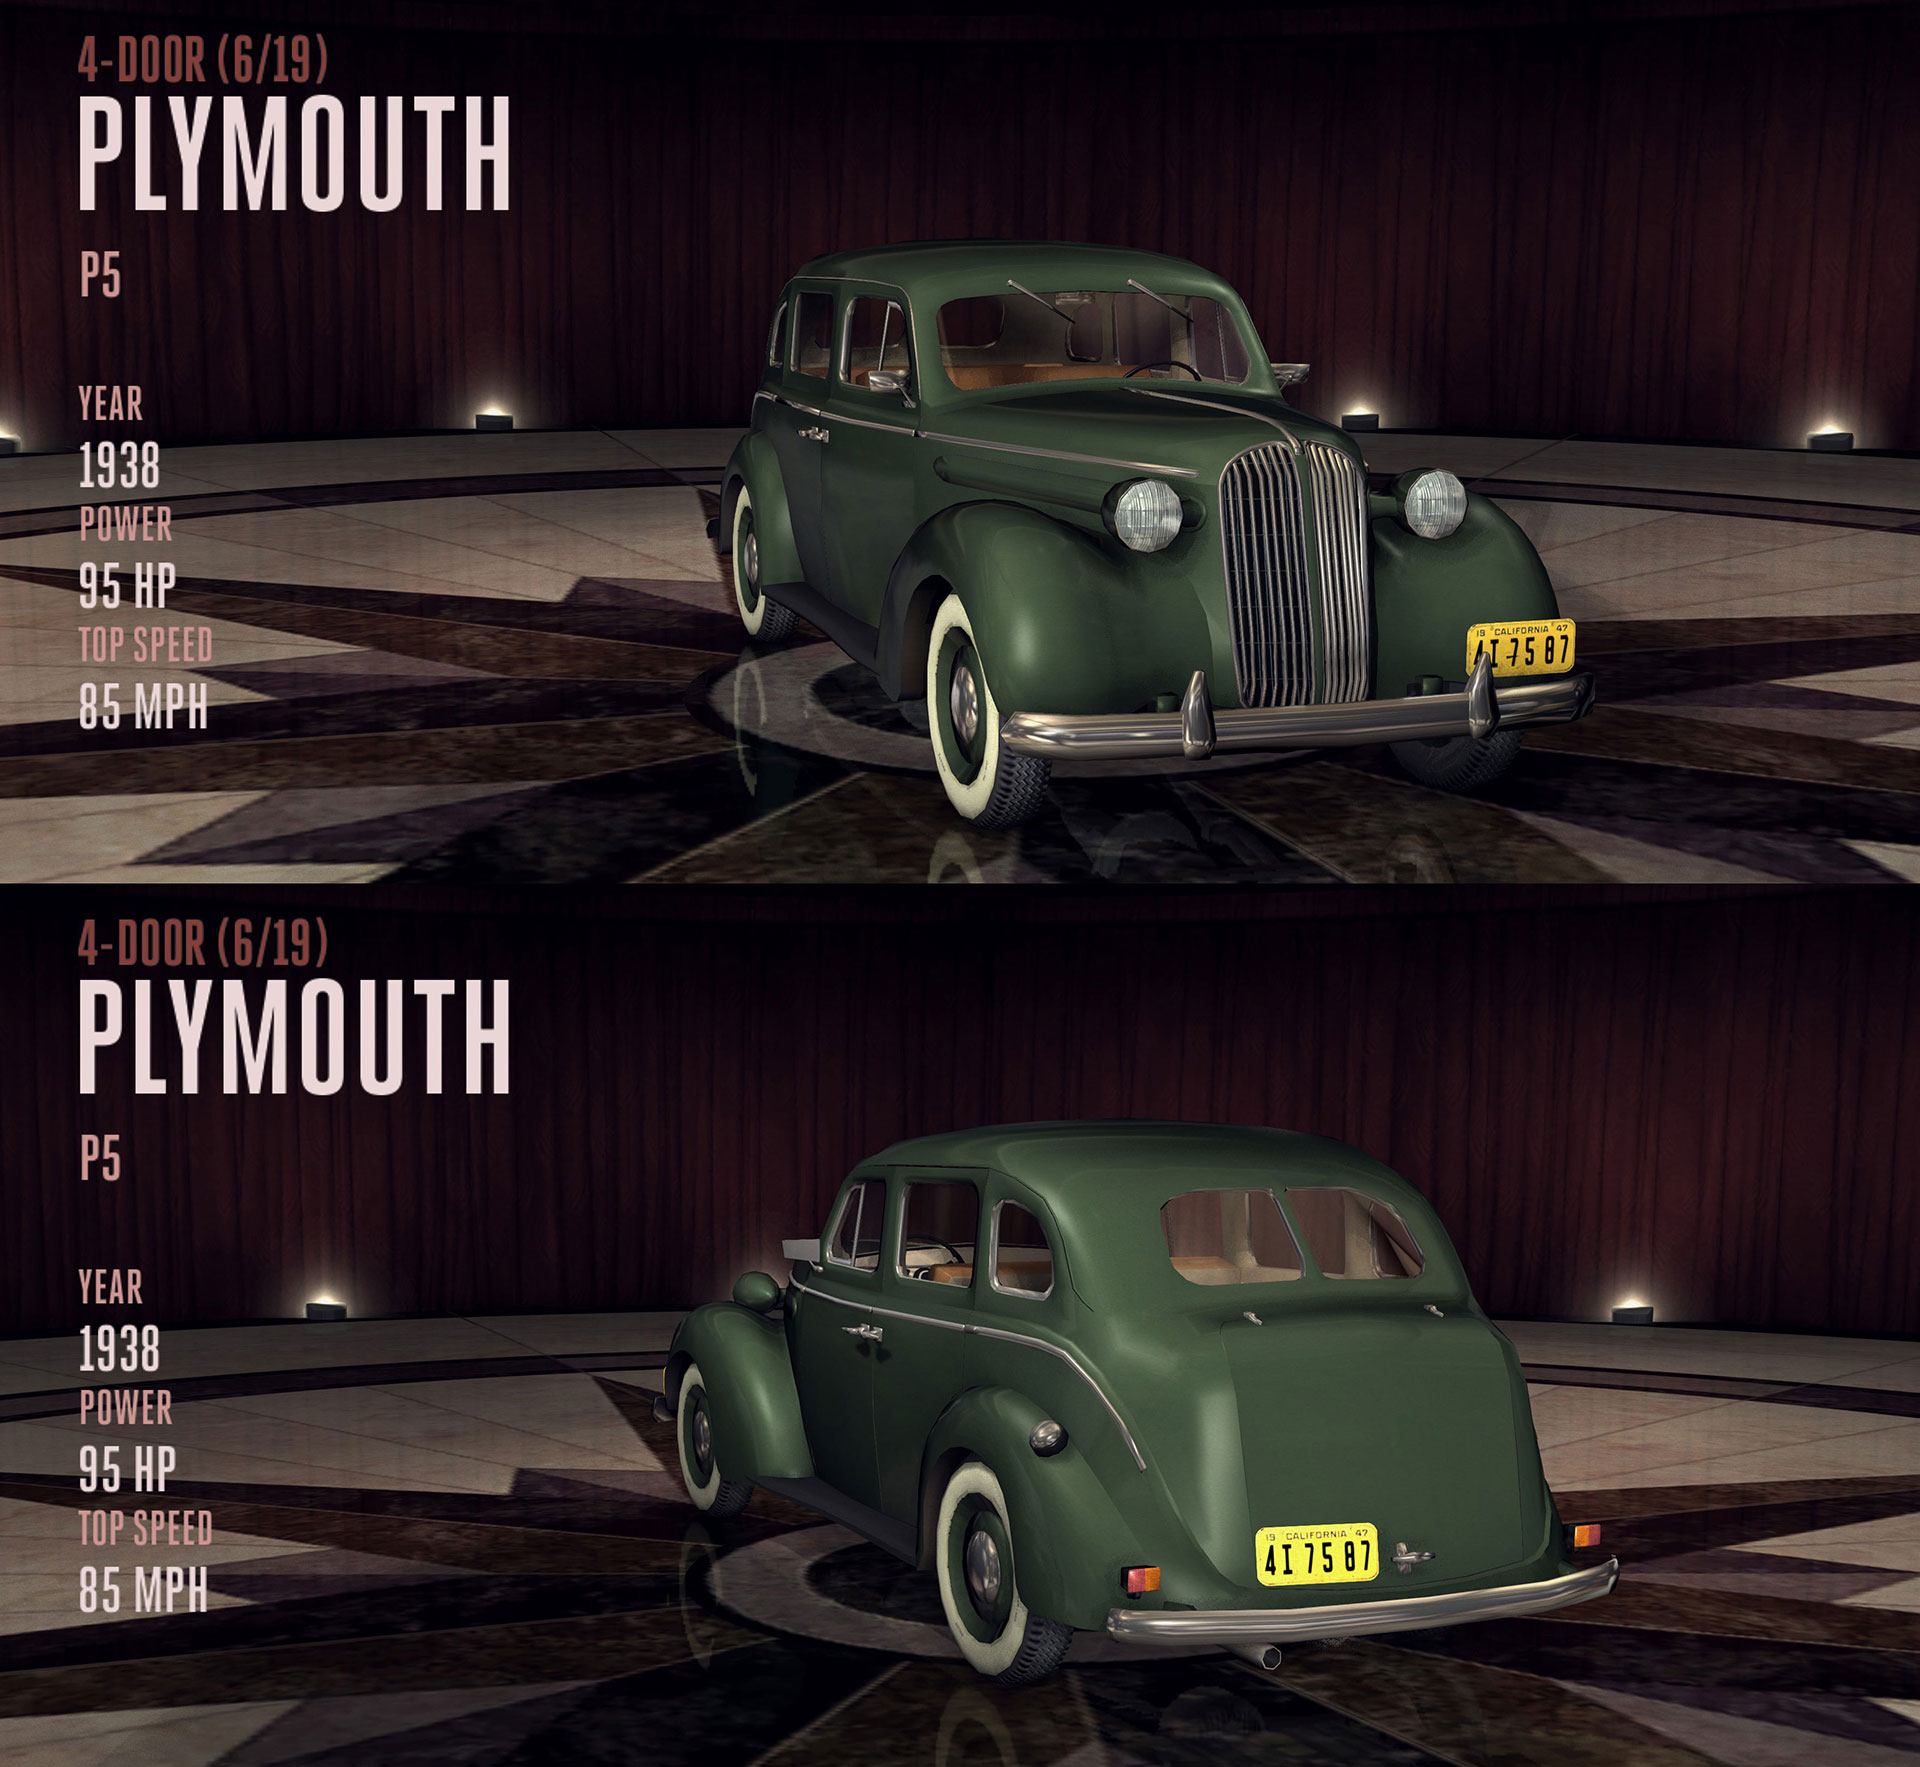 File:1938-plymouth-p5.jpg